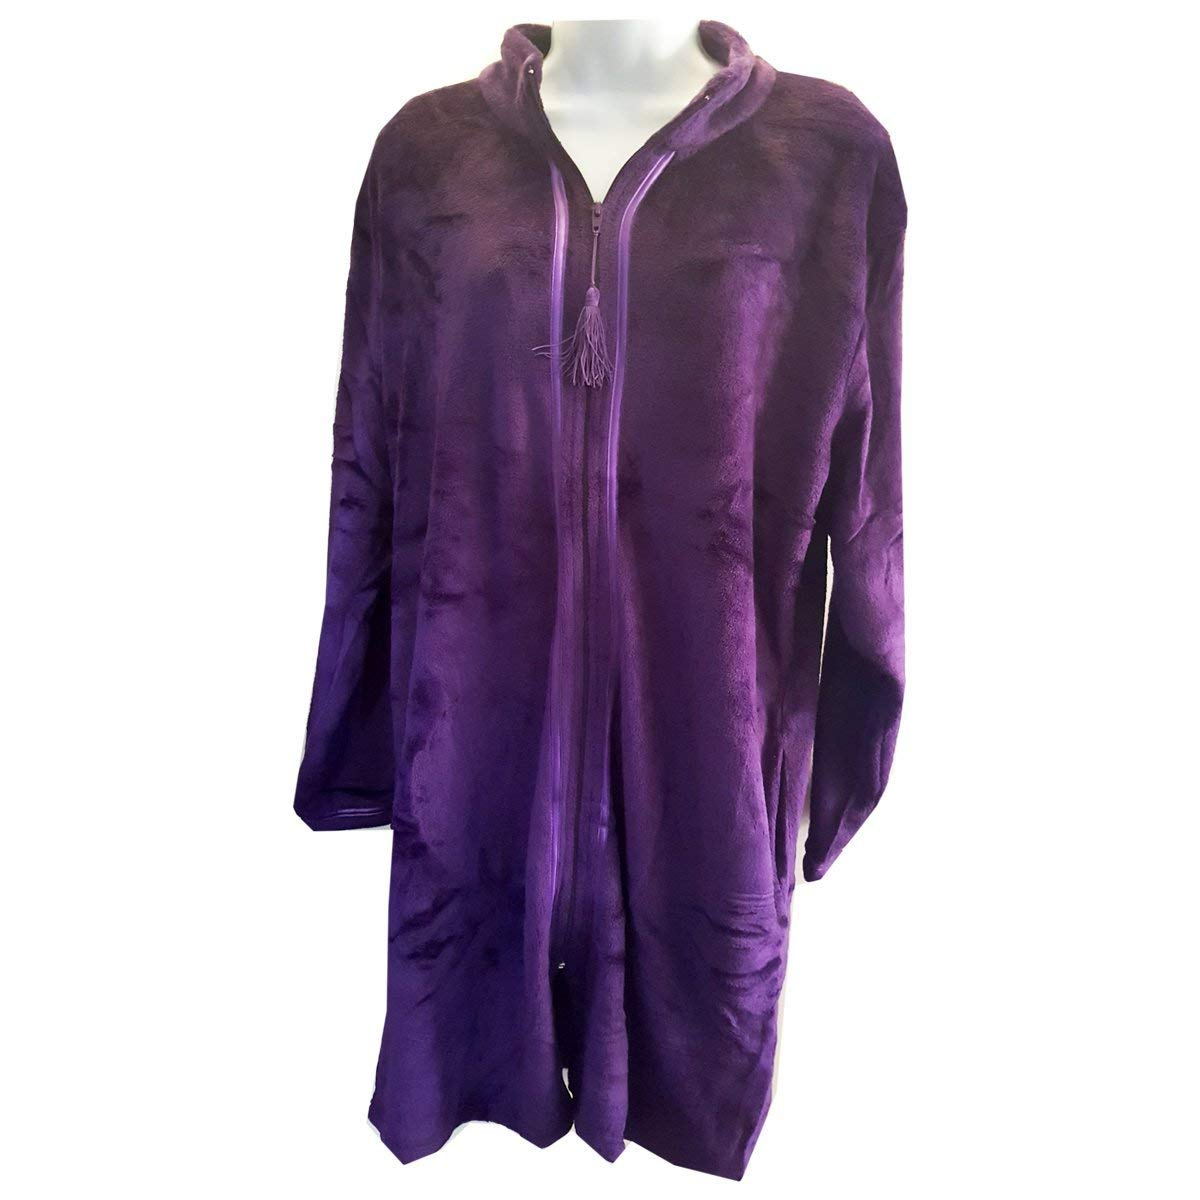 cc4ca2a5d9 Serre  Women s Velvet Plush Robe Zipper Front w Tassels - Purple